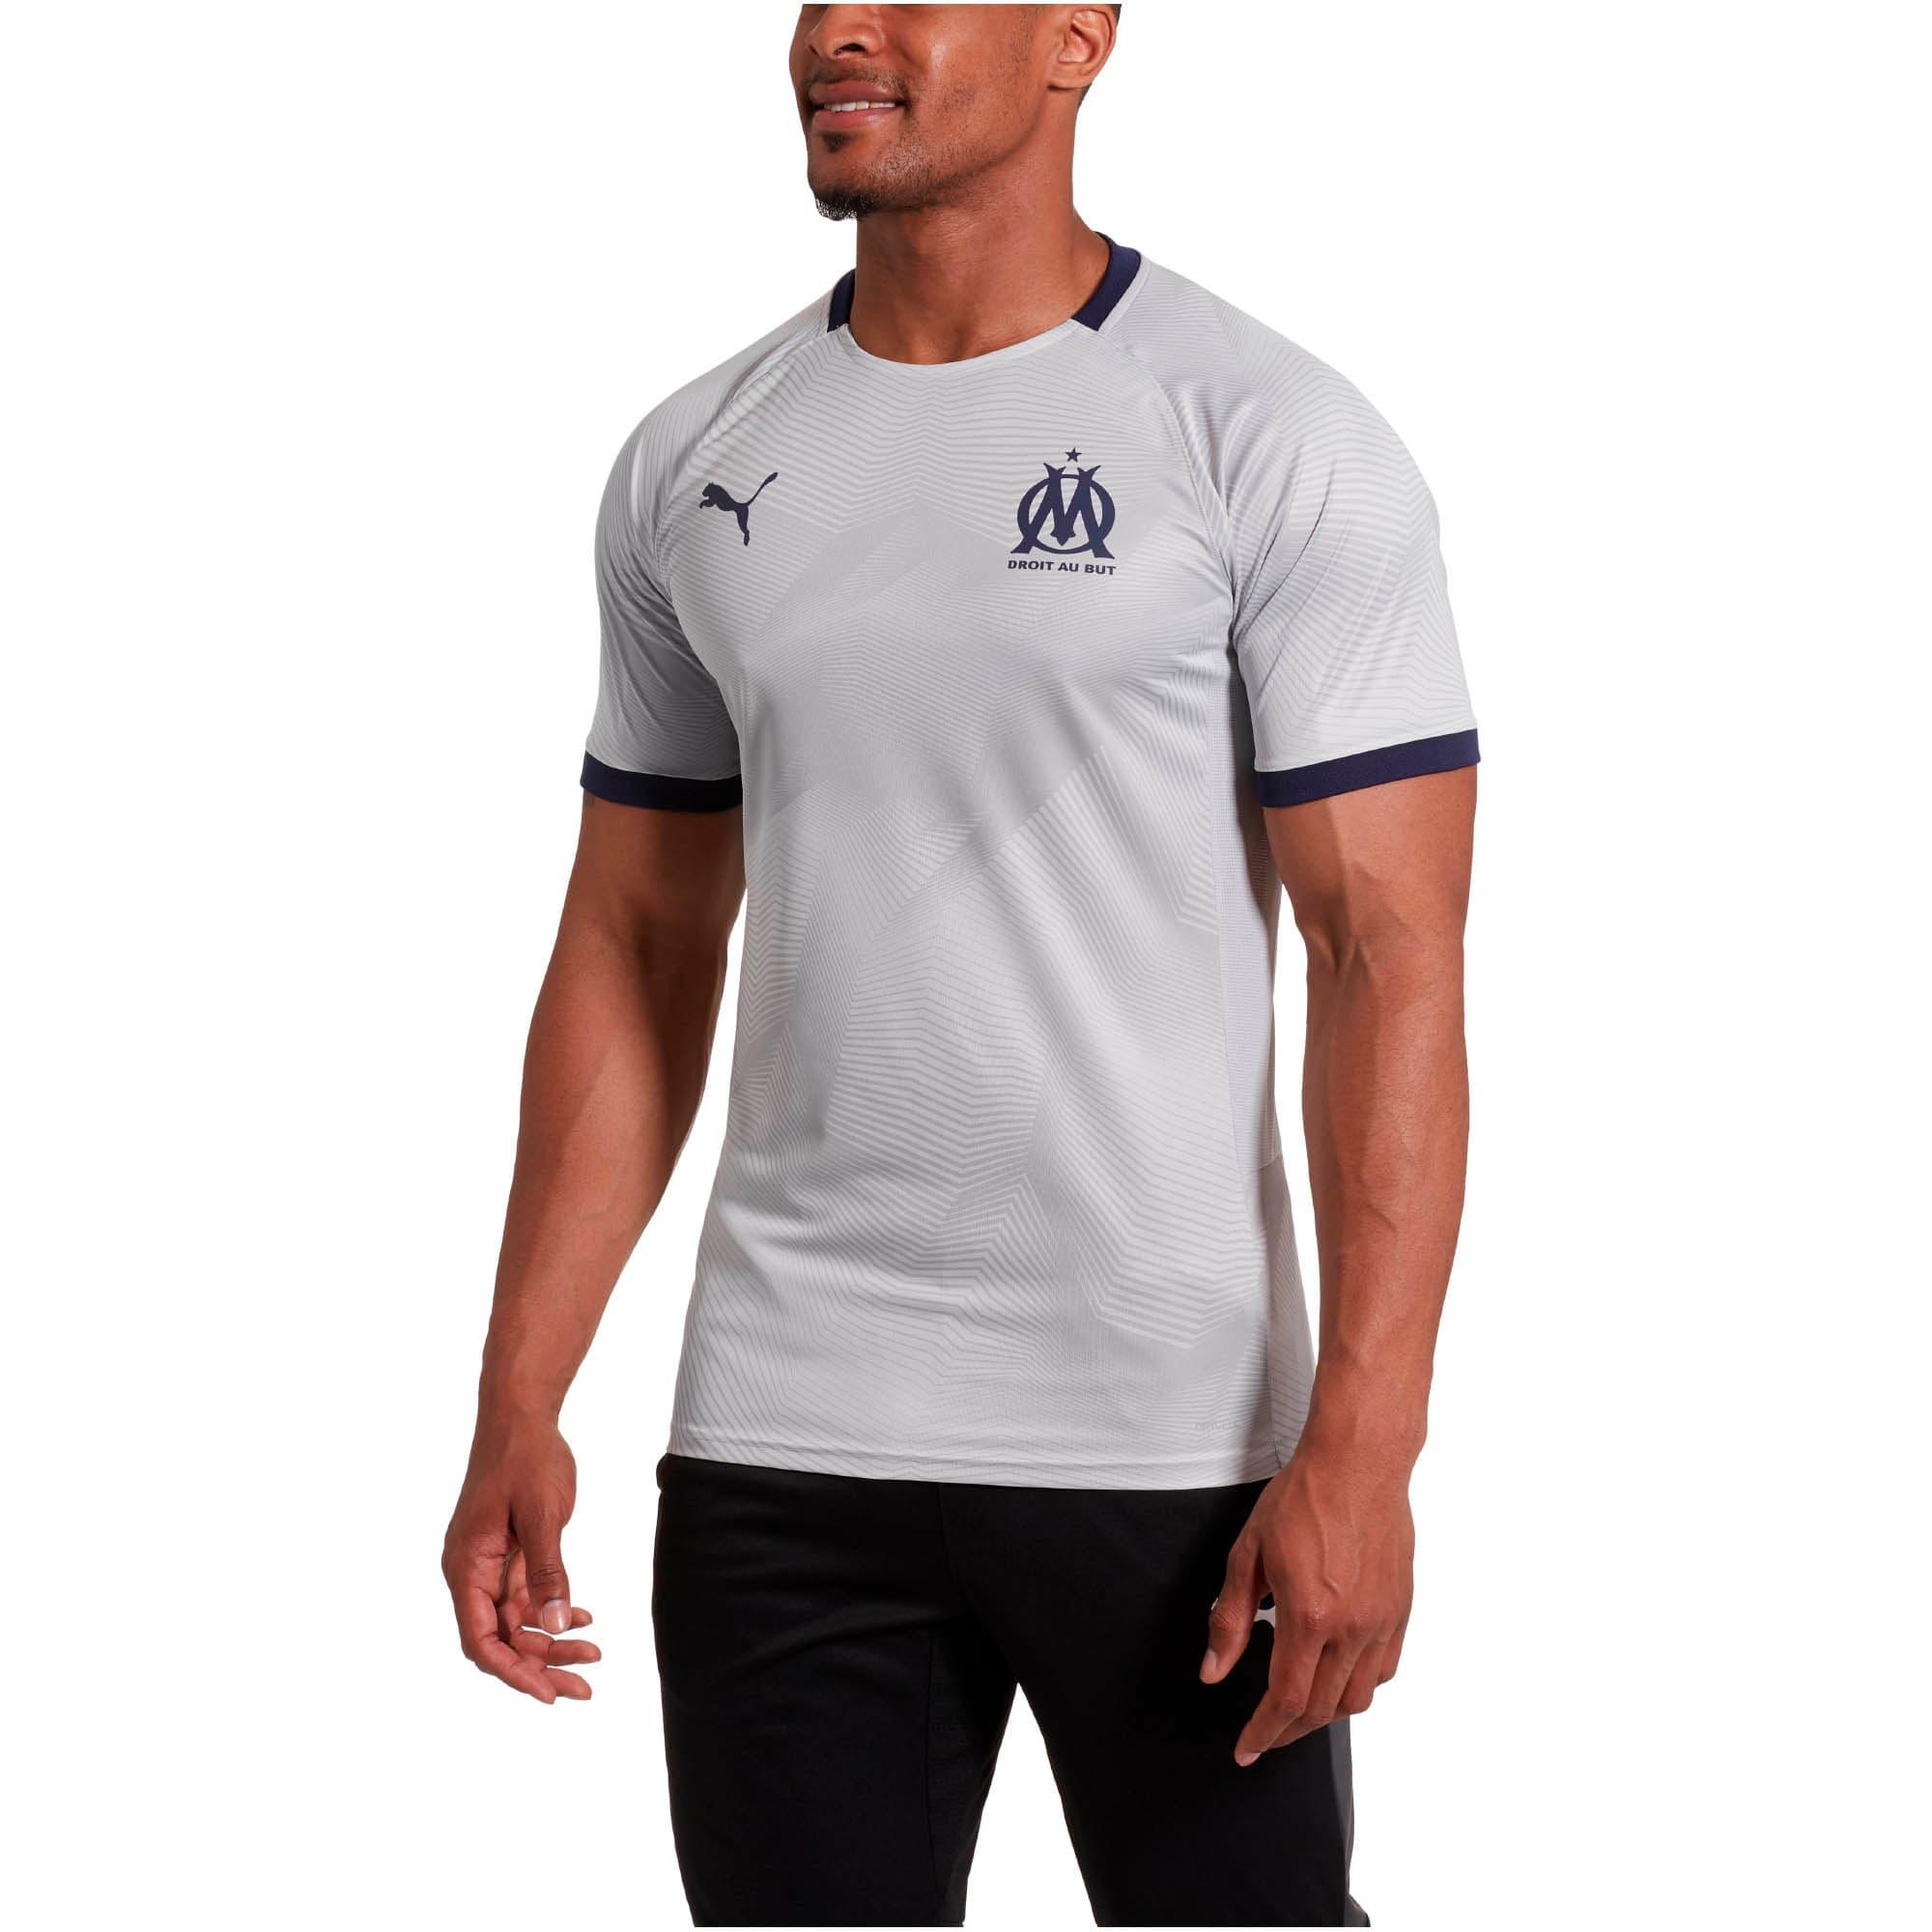 Thumbnail 2 of Olympique de Marseille Men's Graphic Jersey, High Rise-Peacoat, medium